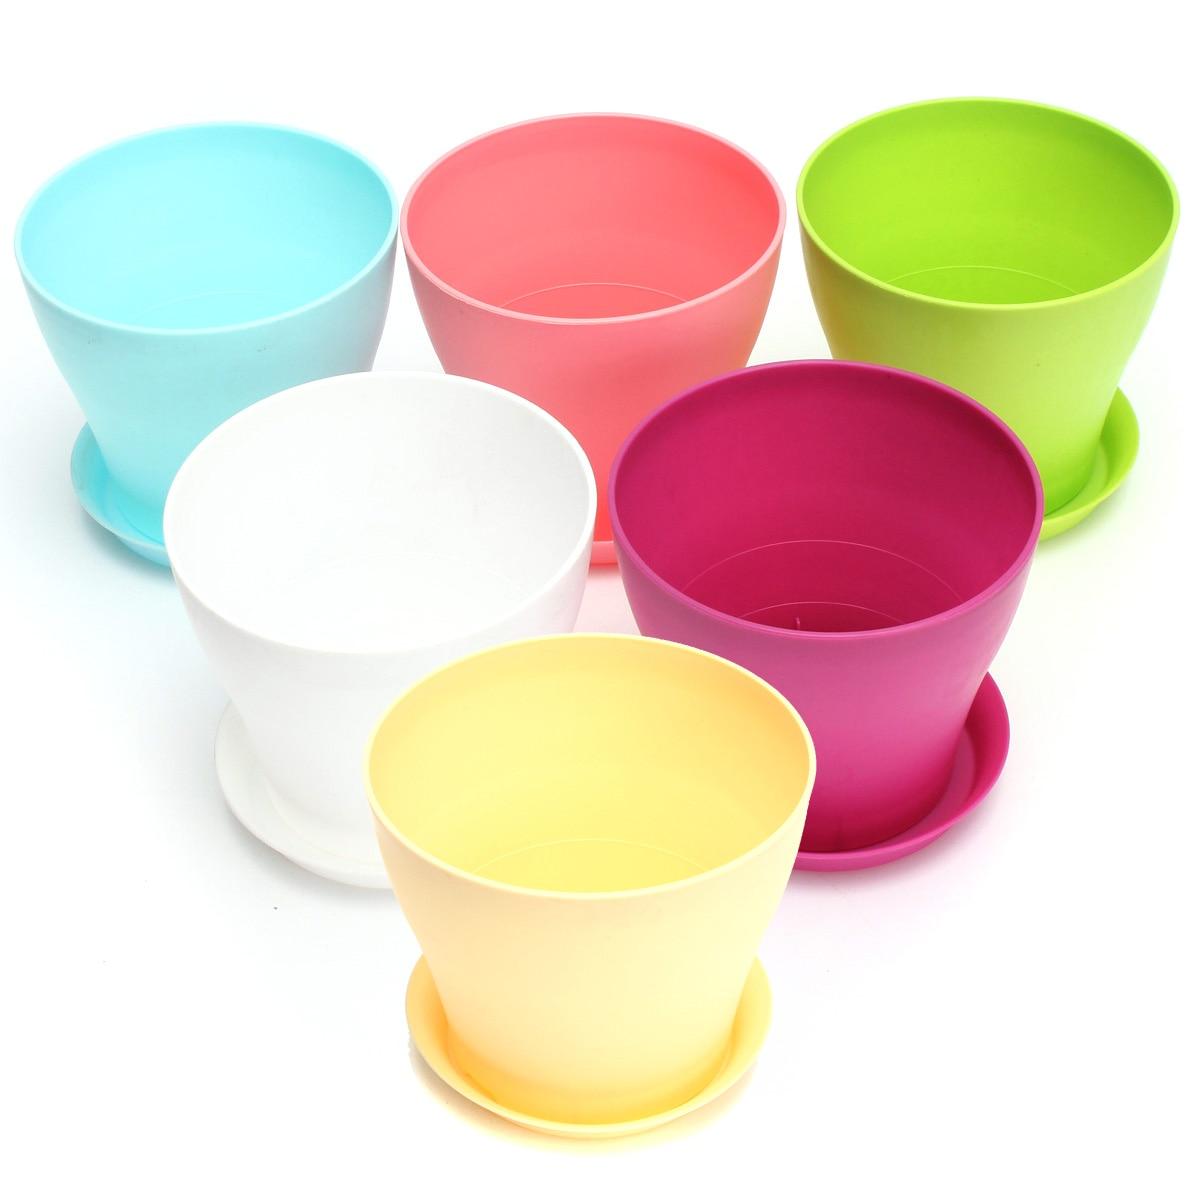 Glossy Plastic Plant Flower Pot Round Shape Candy Colors Planter